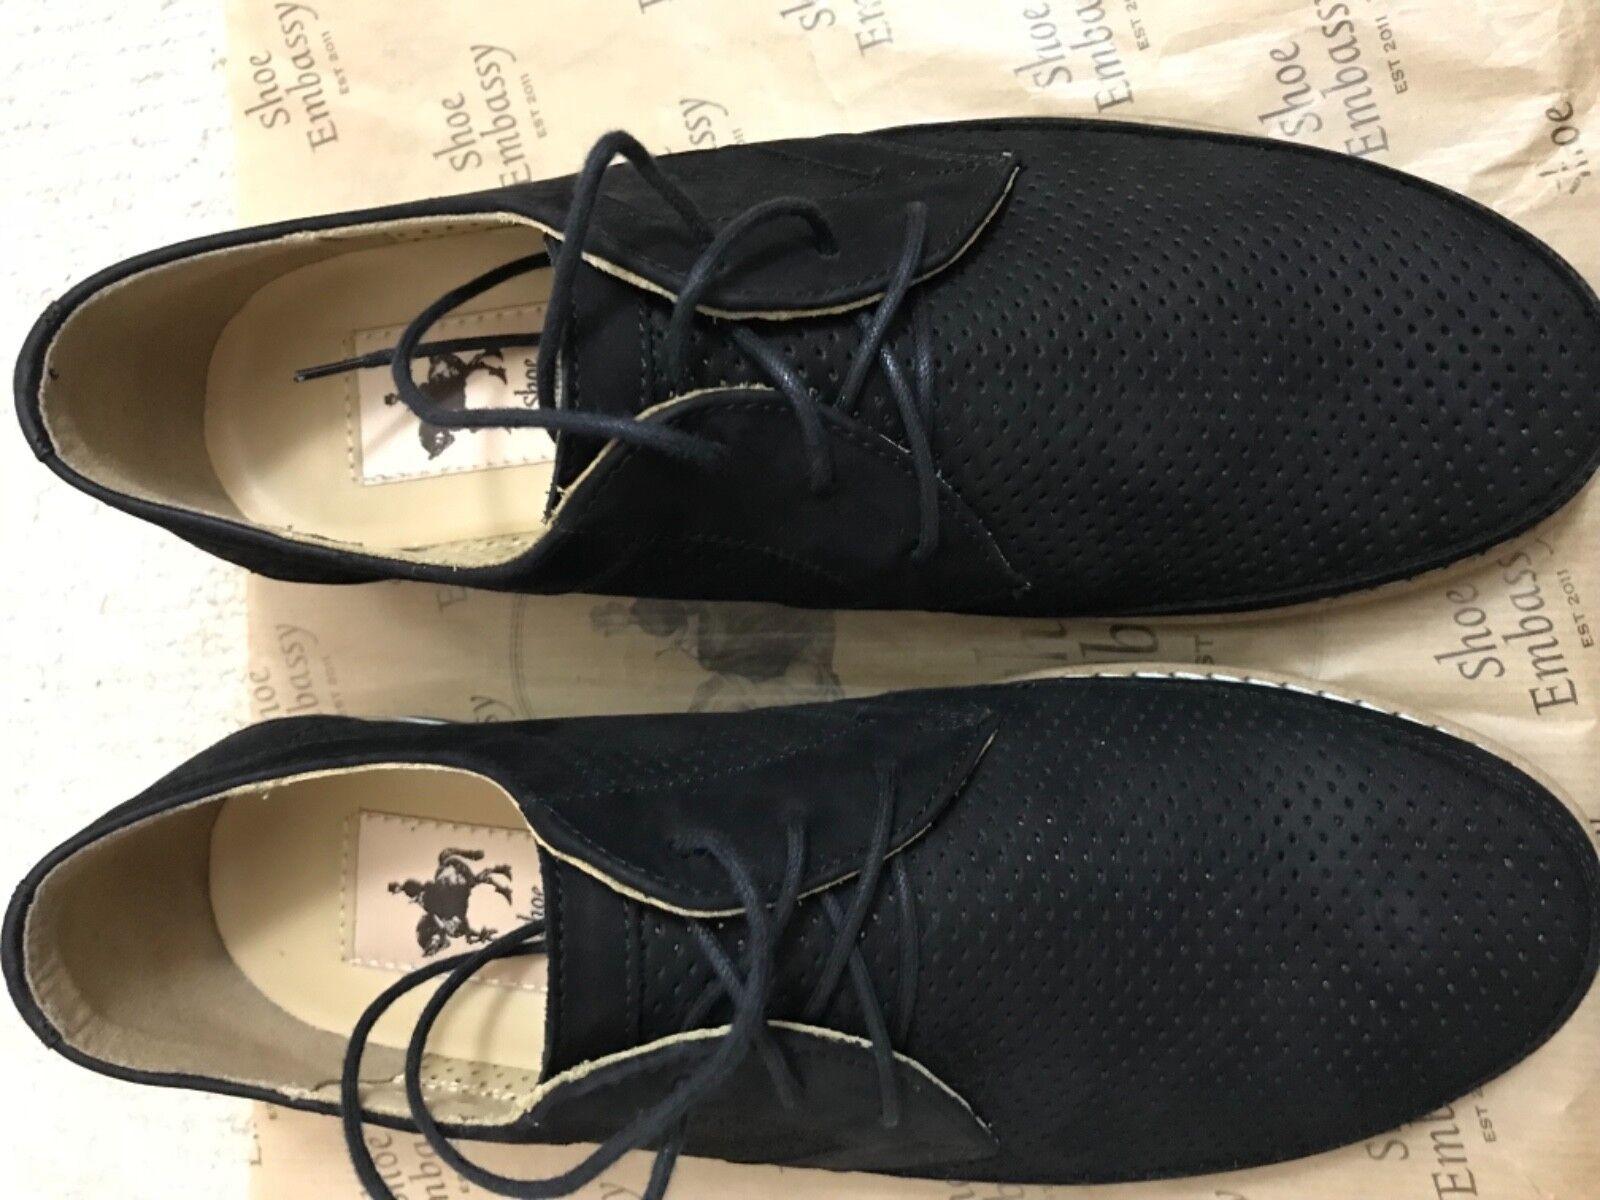 Schuhe Embassy men's schuhe, 95 Größe 38, schwarz,  95 schuhe, 79f92b